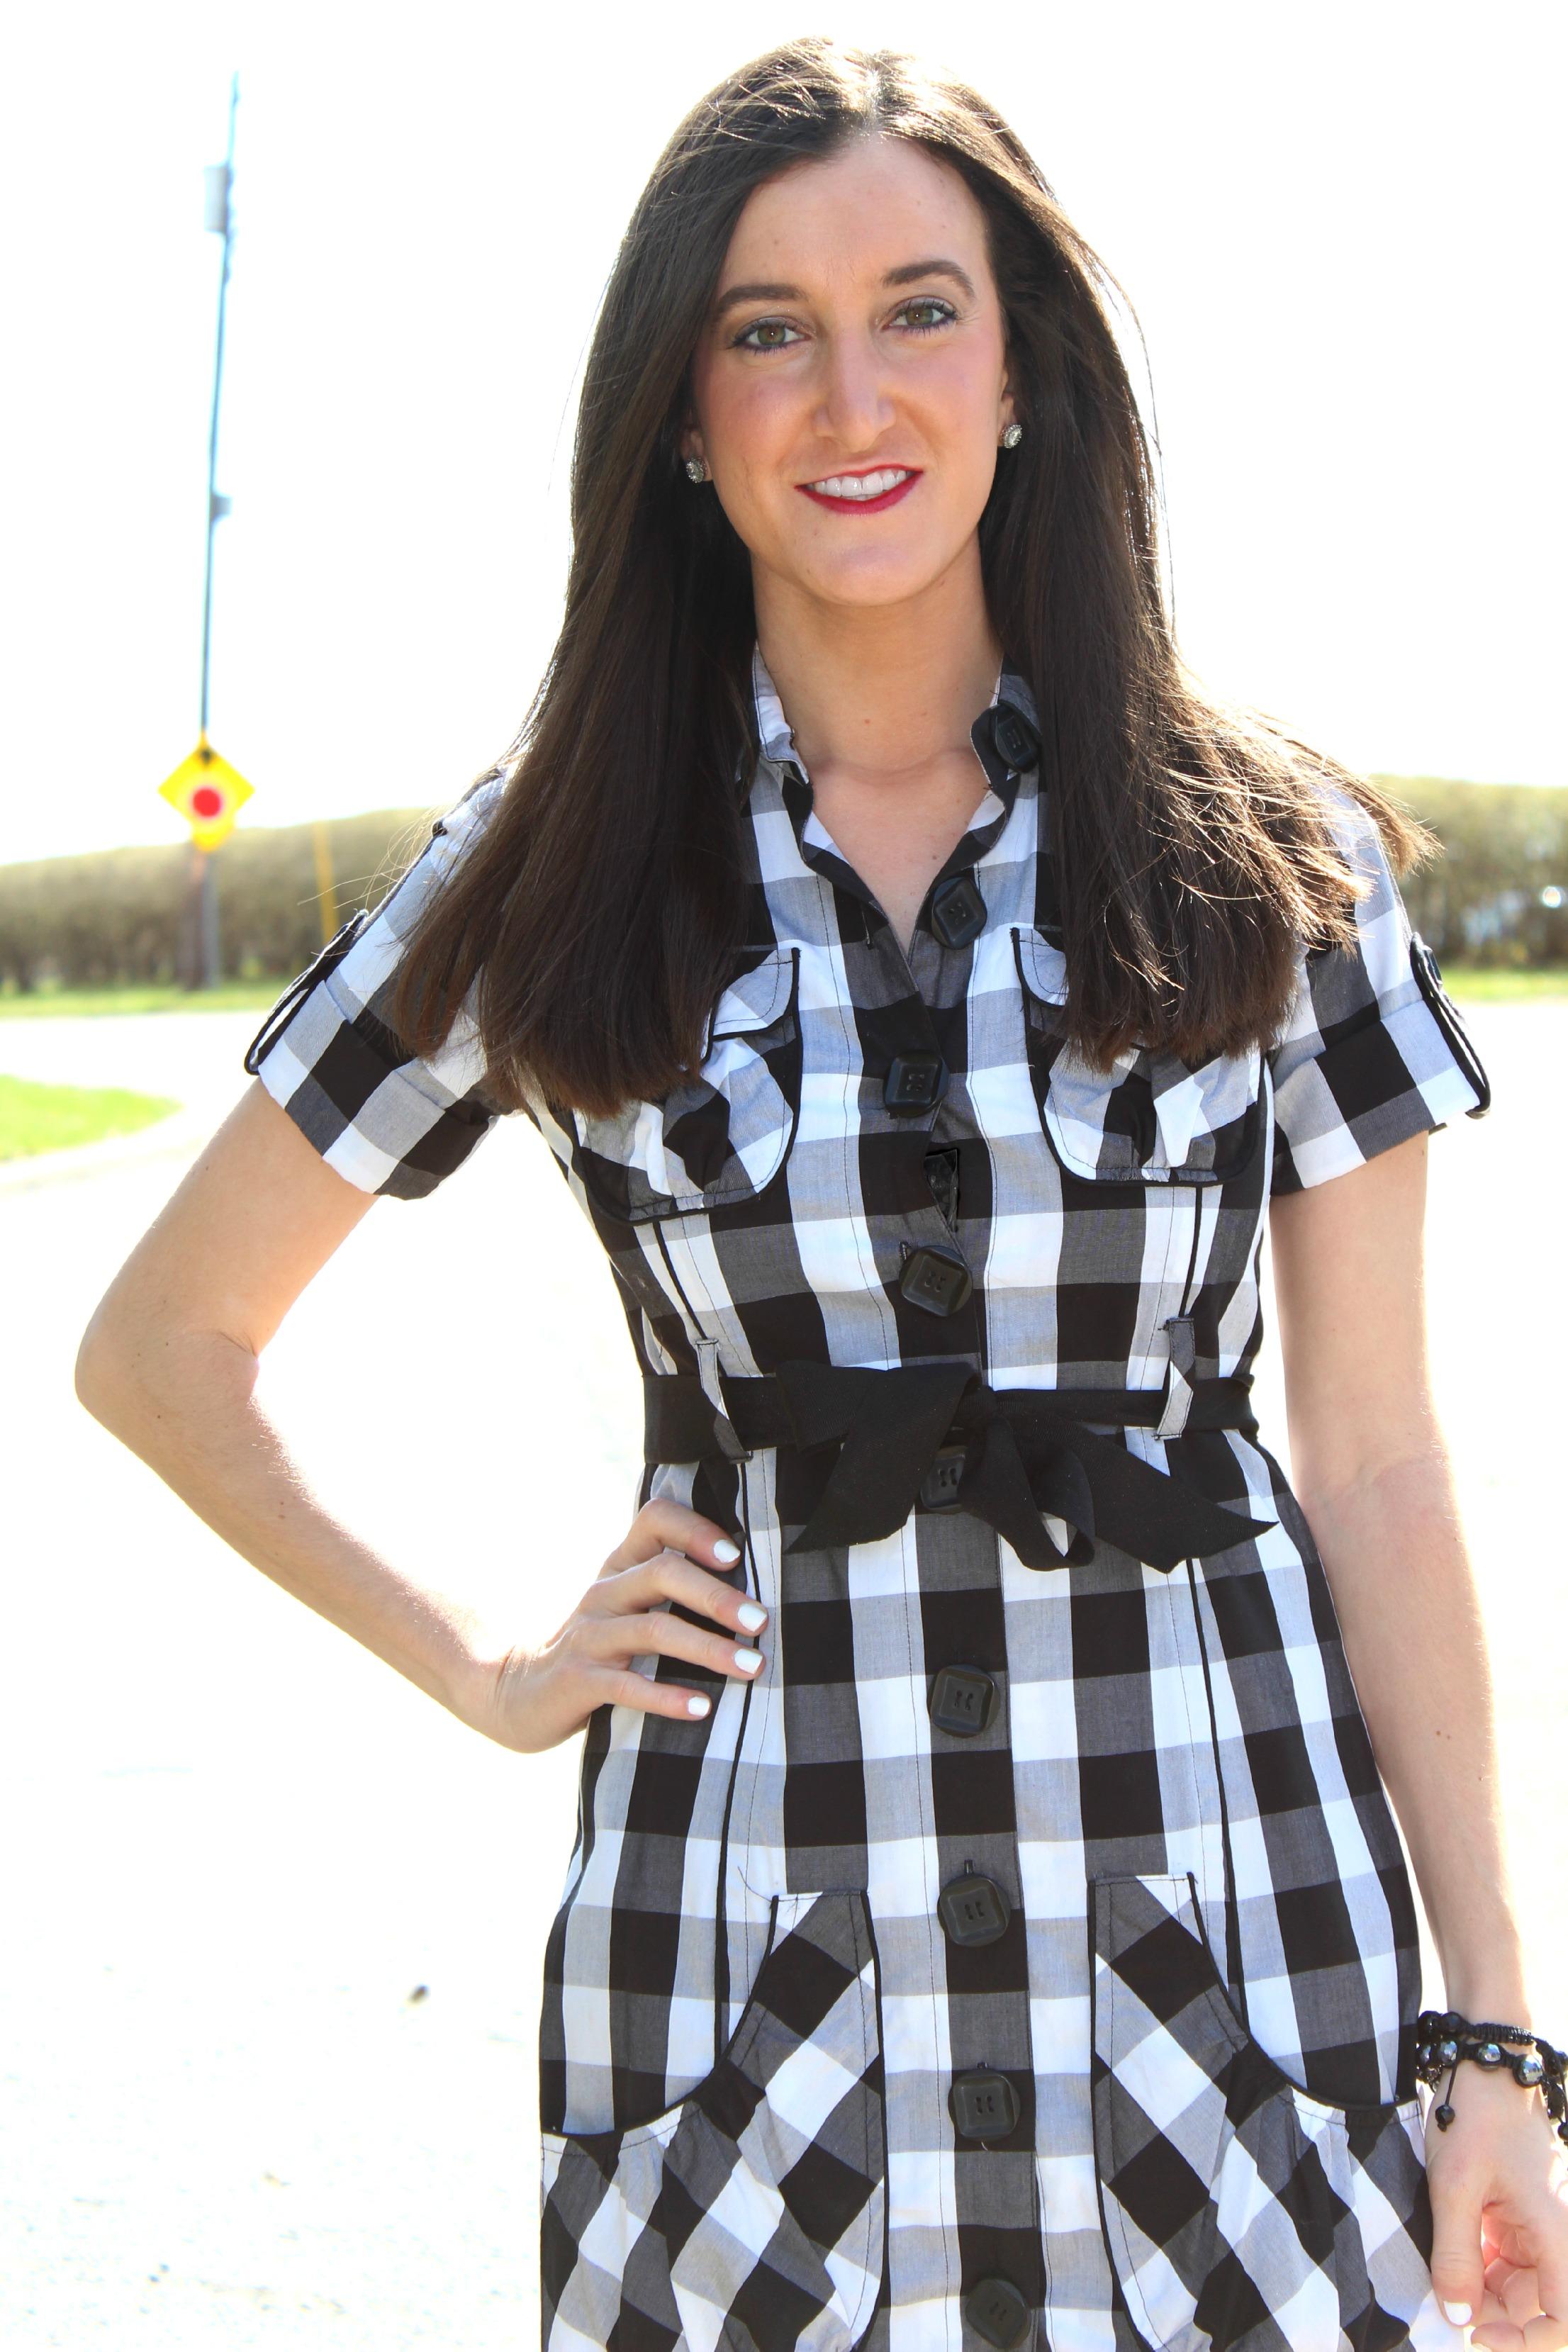 Black and White Checkered Spring Dress